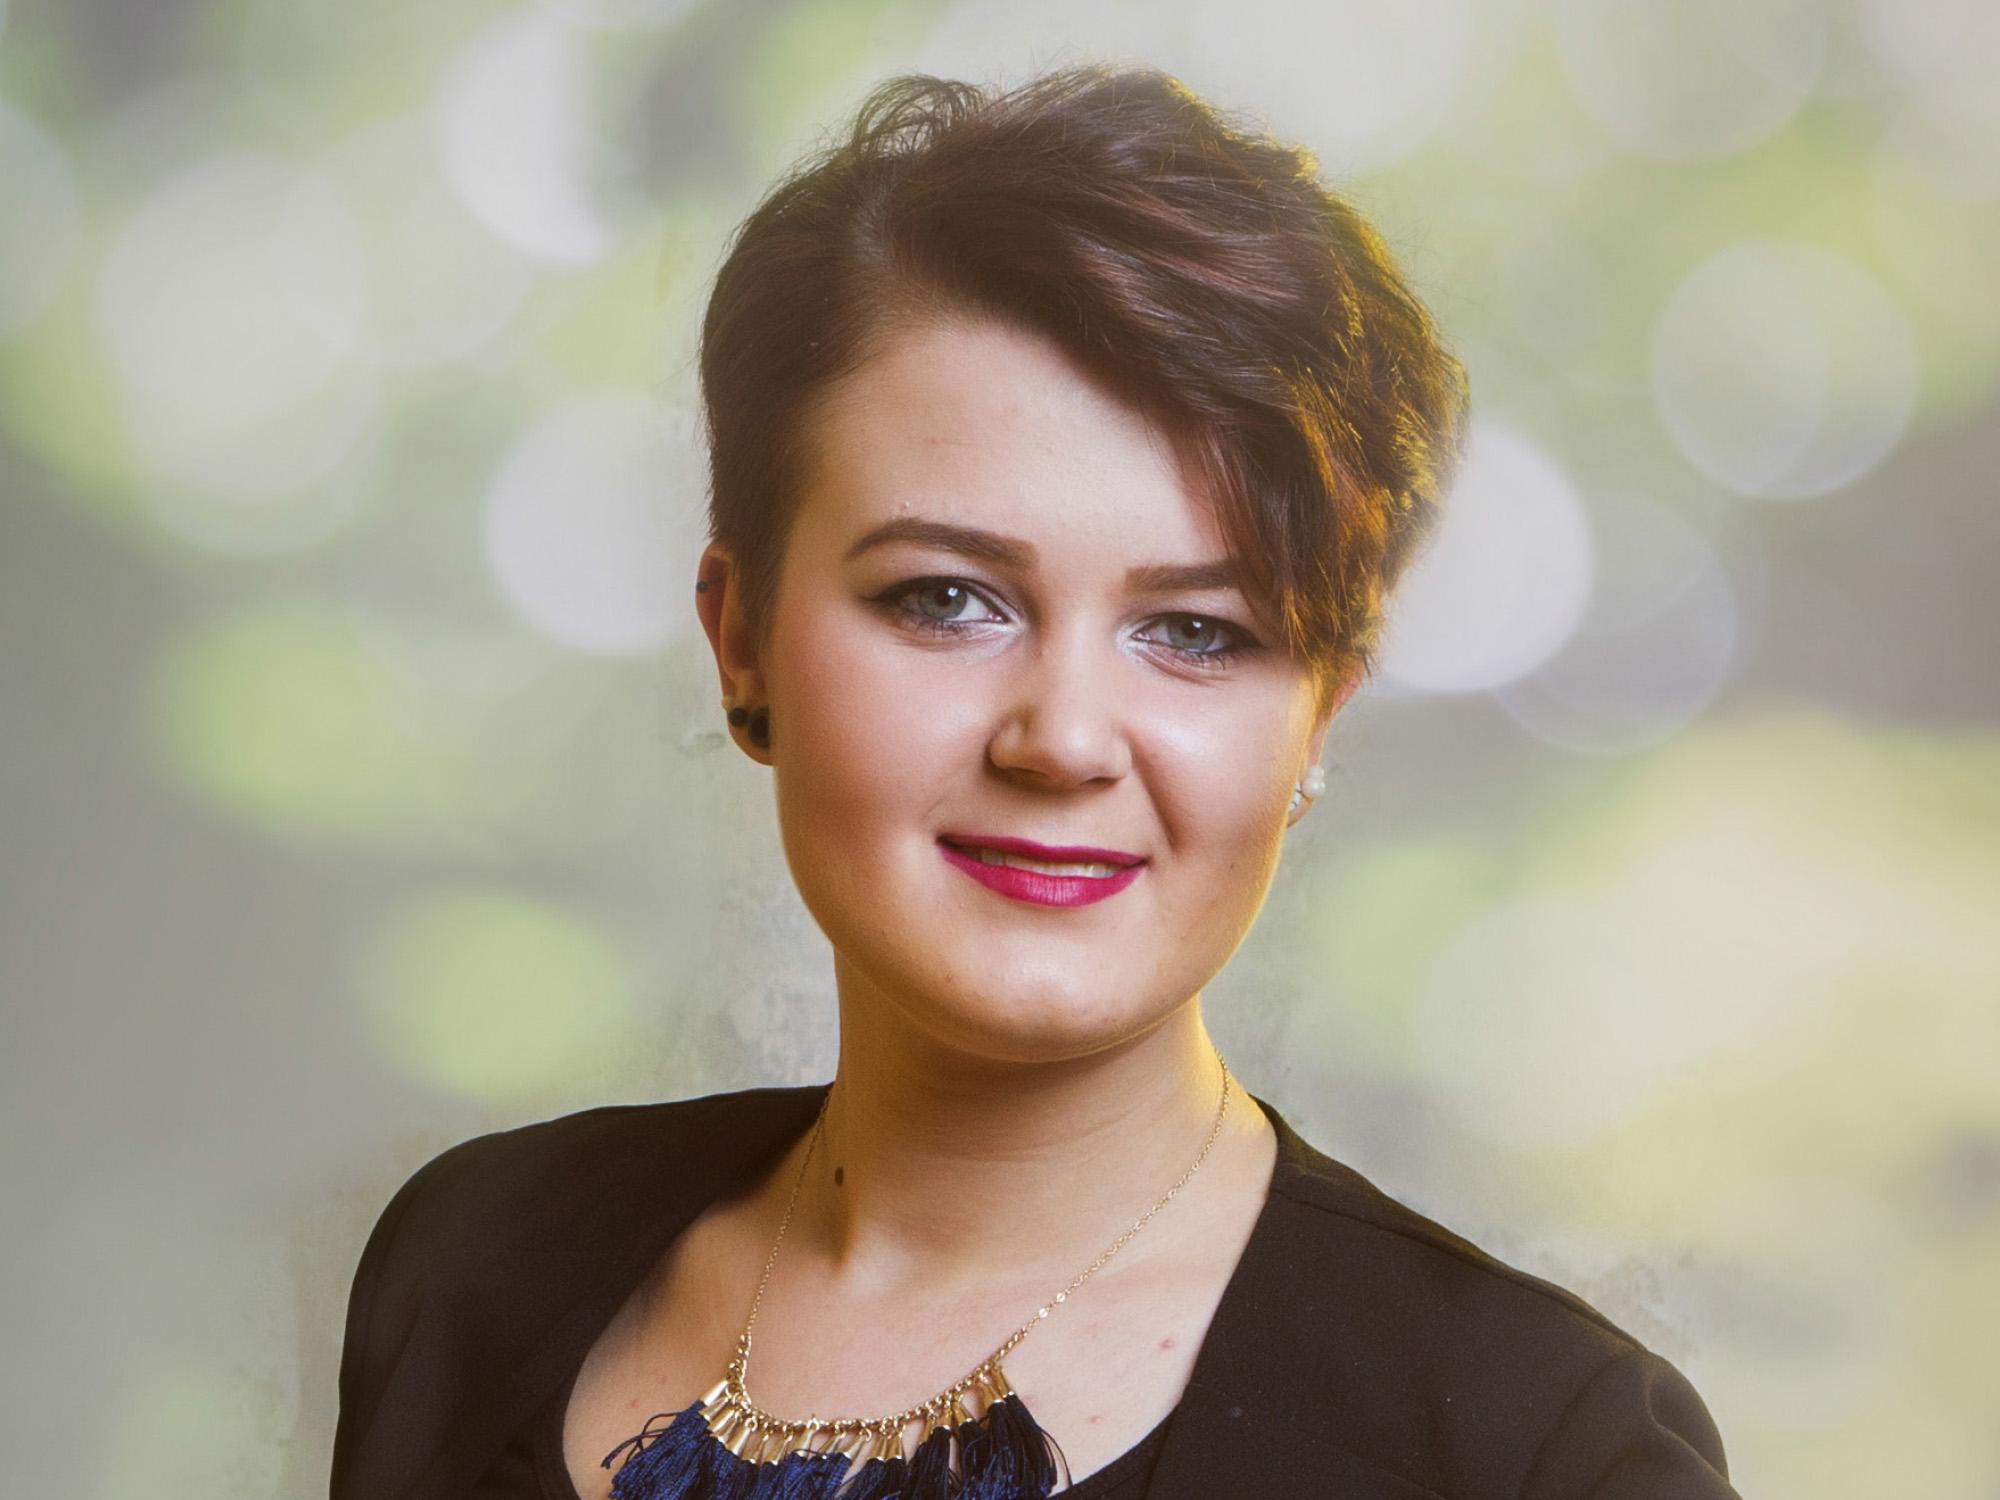 Annika Kilgus, Jungstylistin ·  Daniel Schmid Friseure, Reutlingen